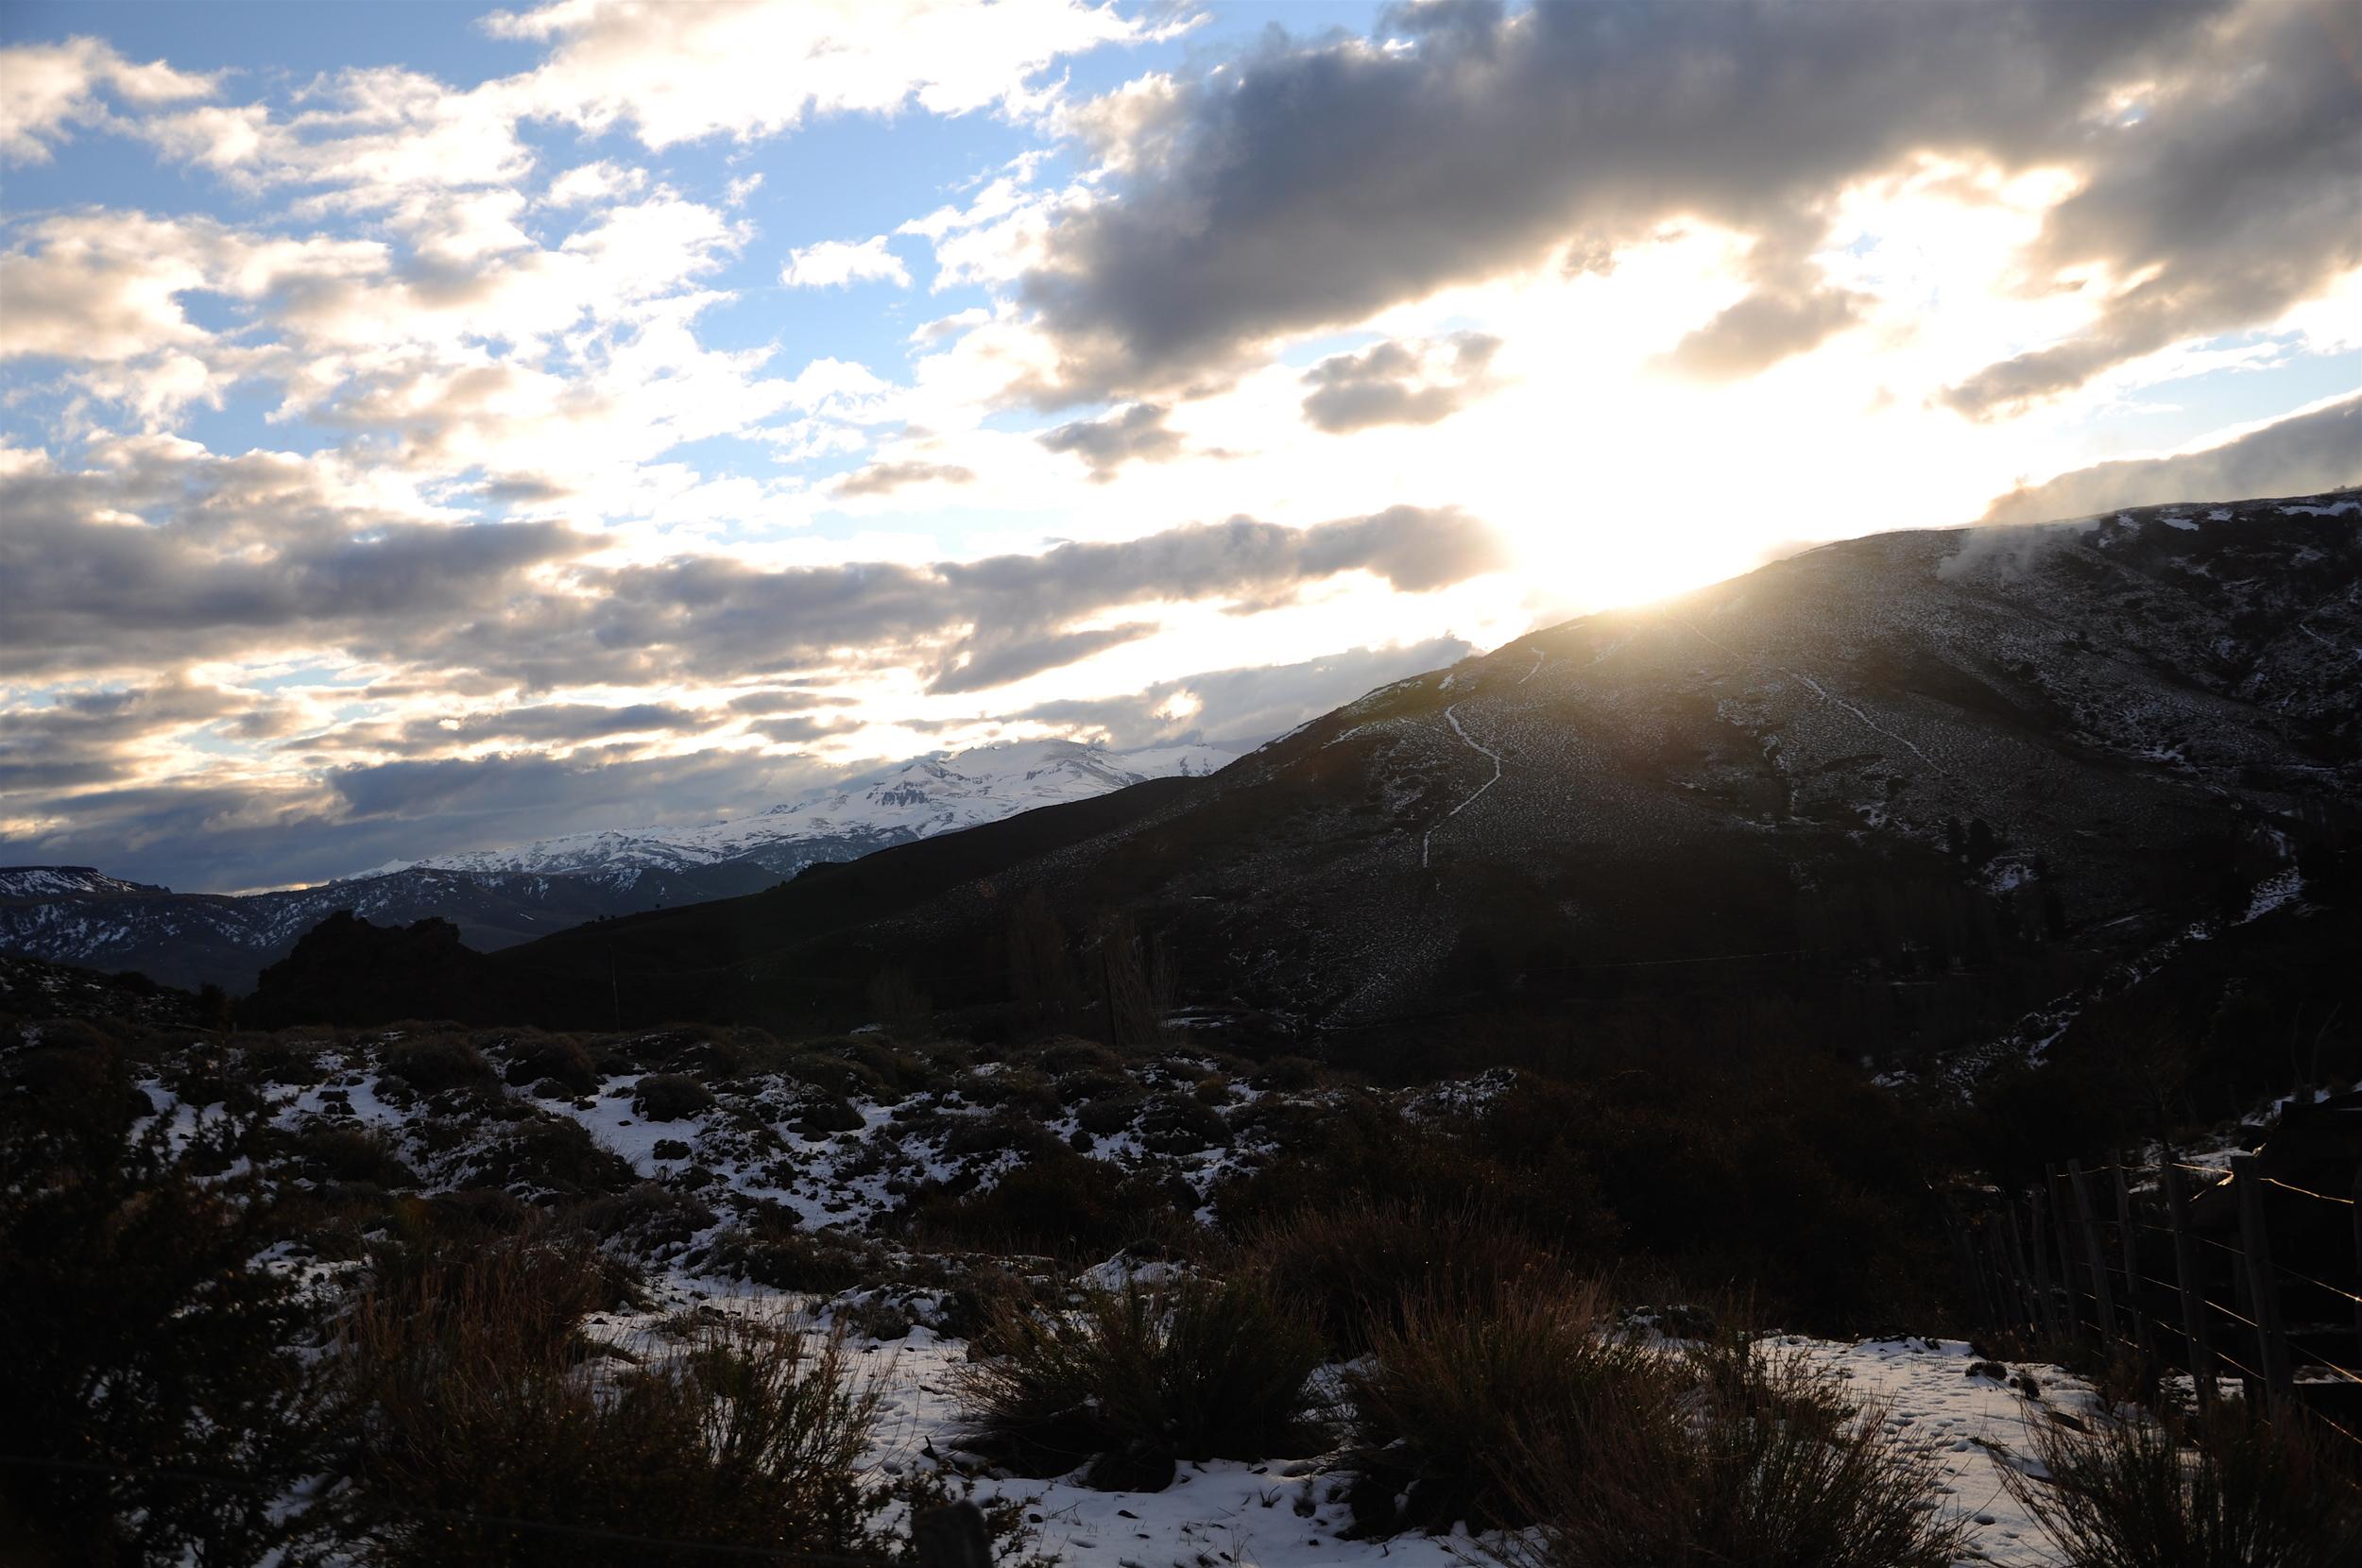 Sunset in Patagonia, Argentina